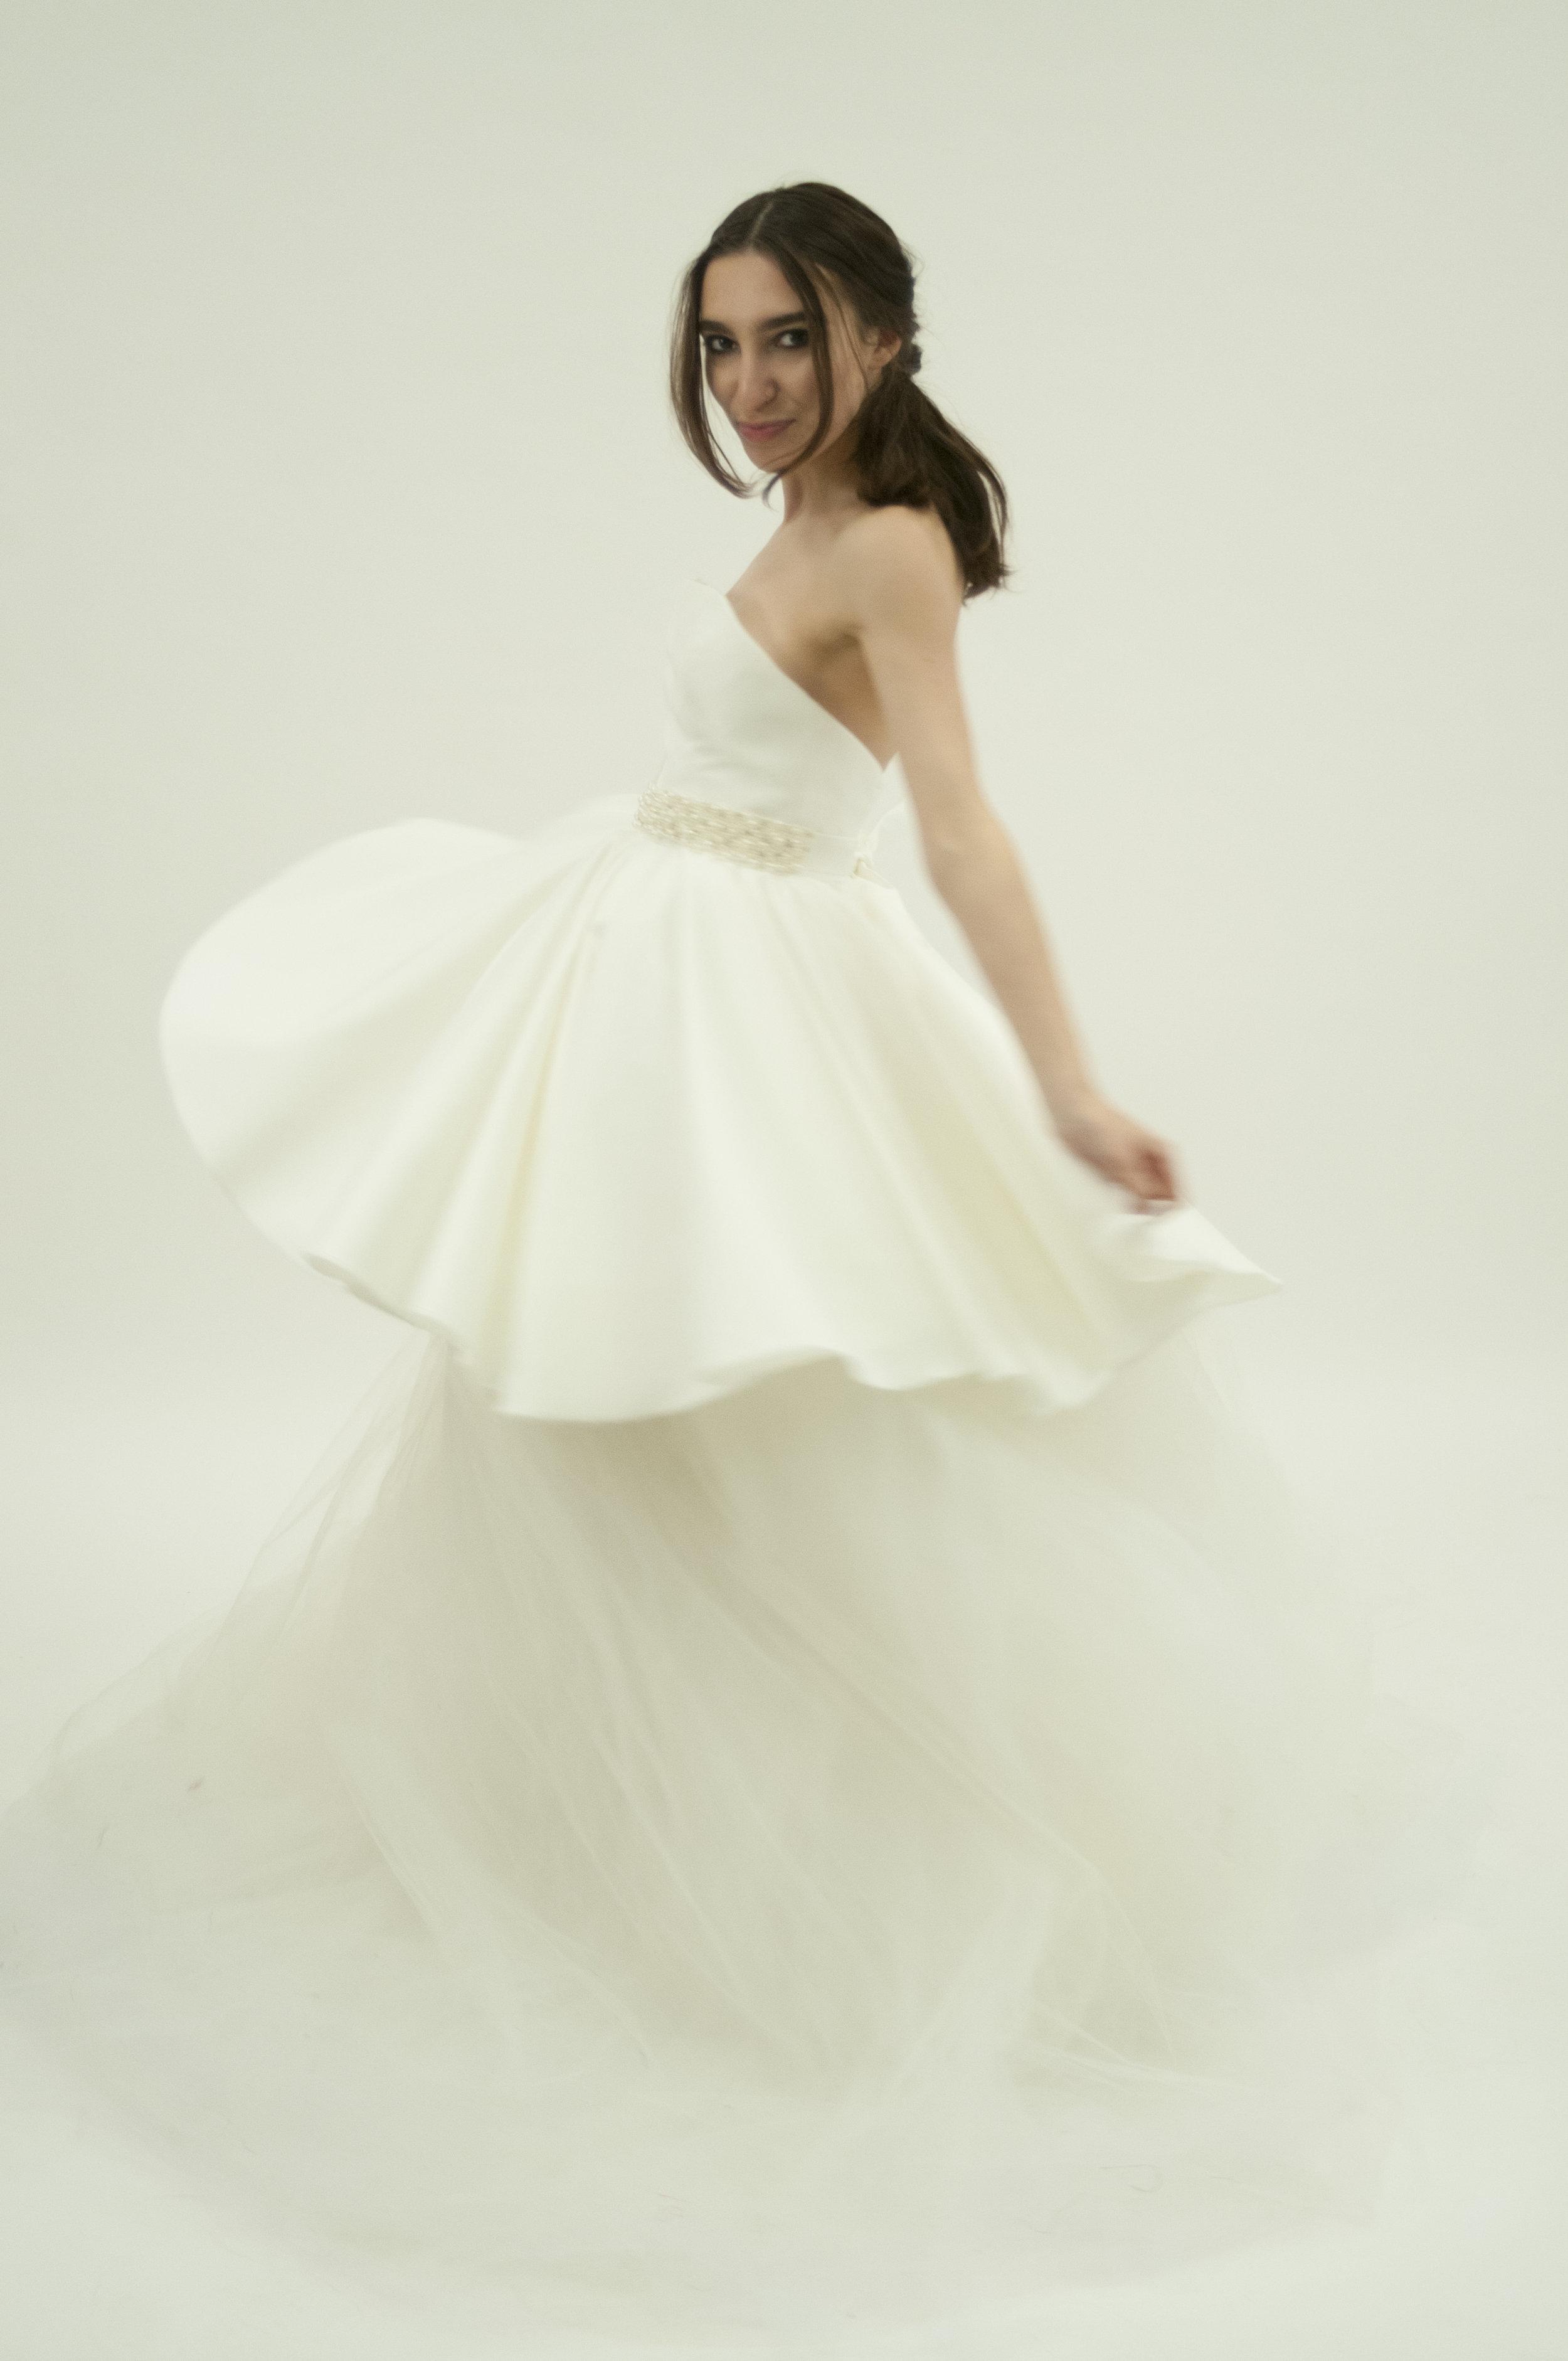 FashionPhotoshoot_042018_0677.jpg